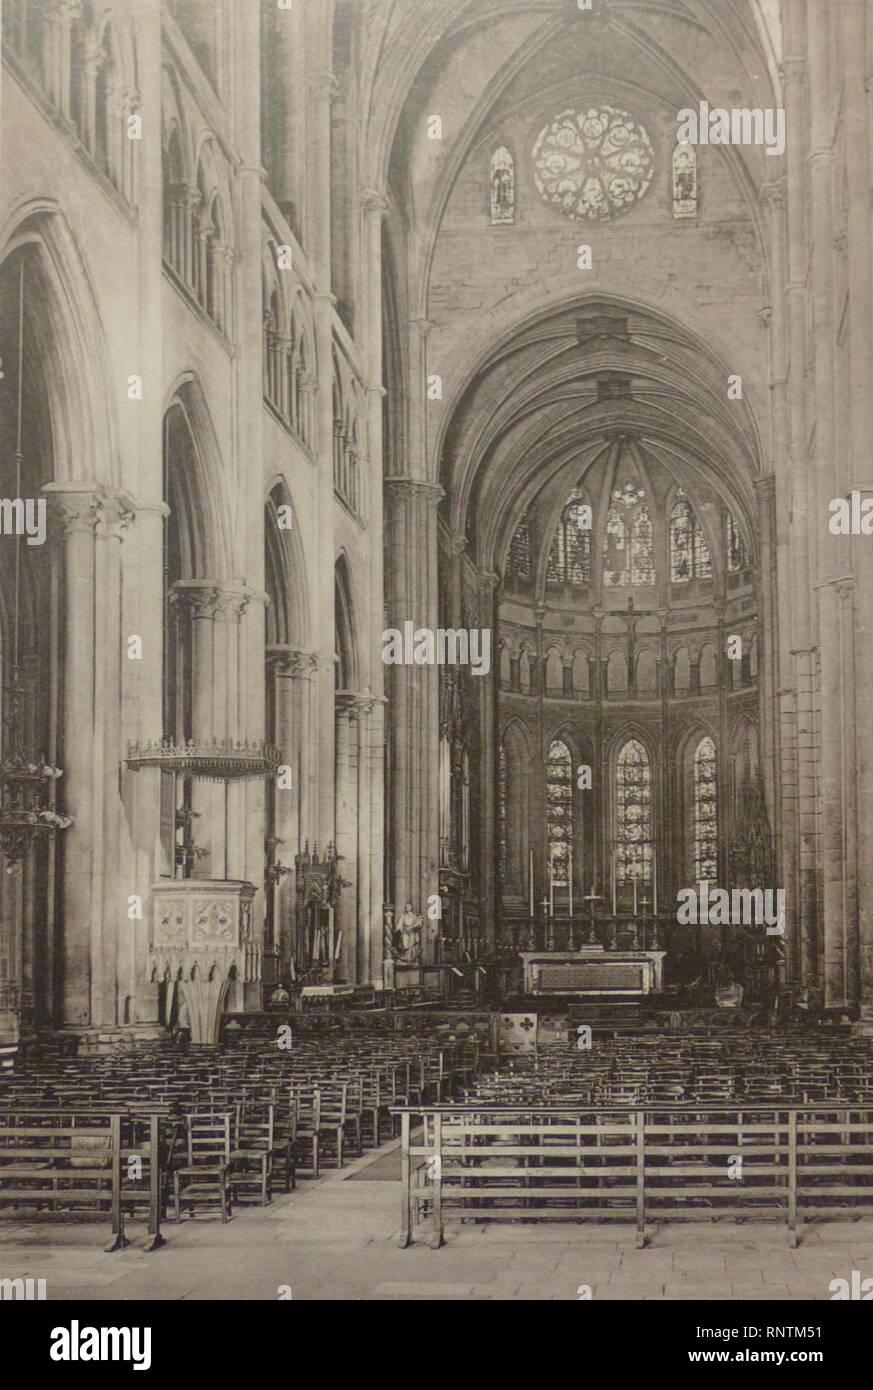 Cathédrale intérieur fin XIXe. Stockbild